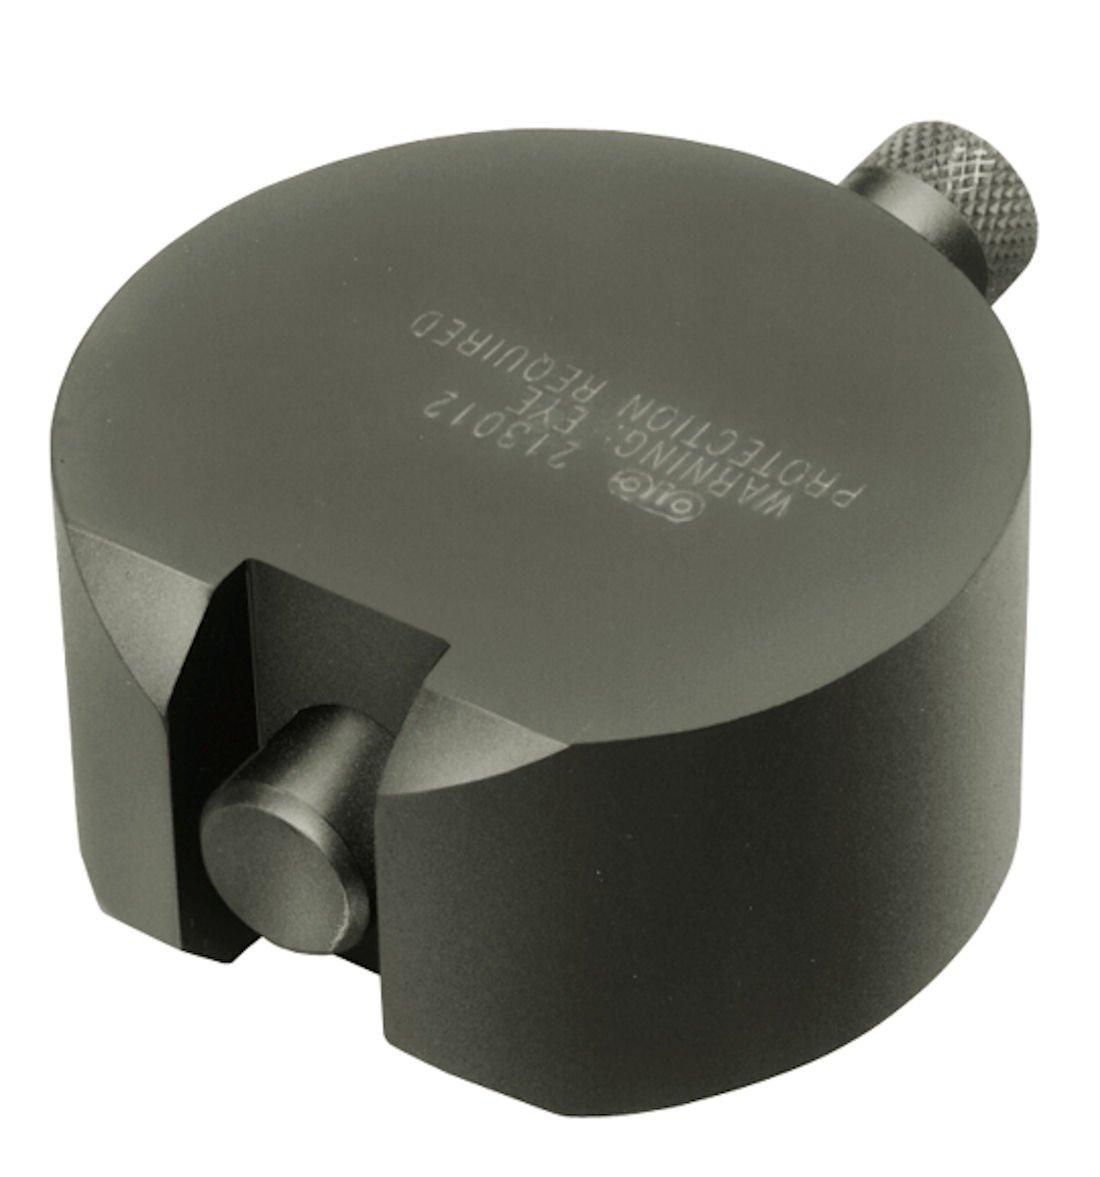 OTC 5045 Drive Pin Installing Tool